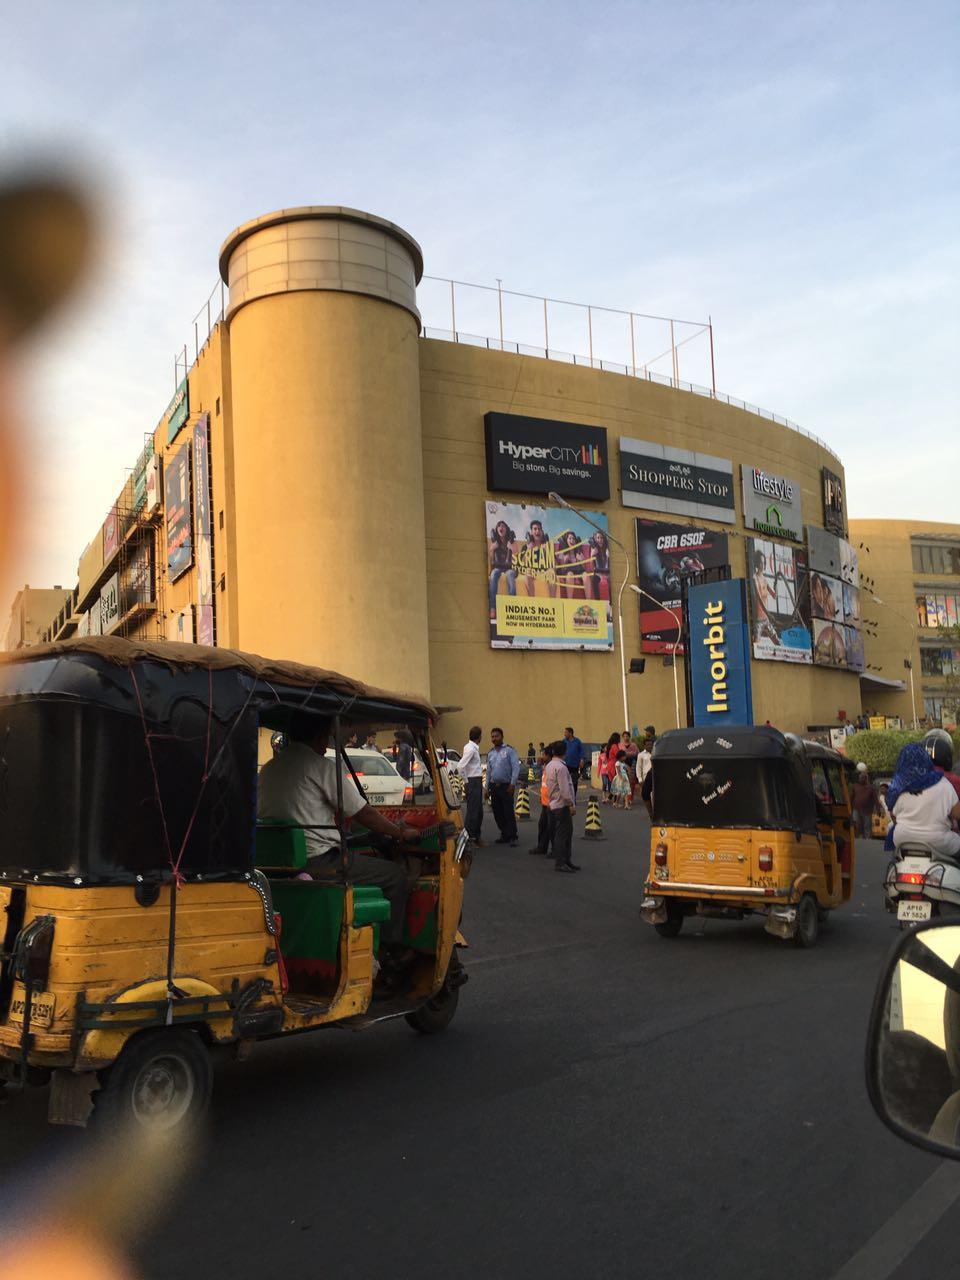 Inorbit mall, Hyderabad